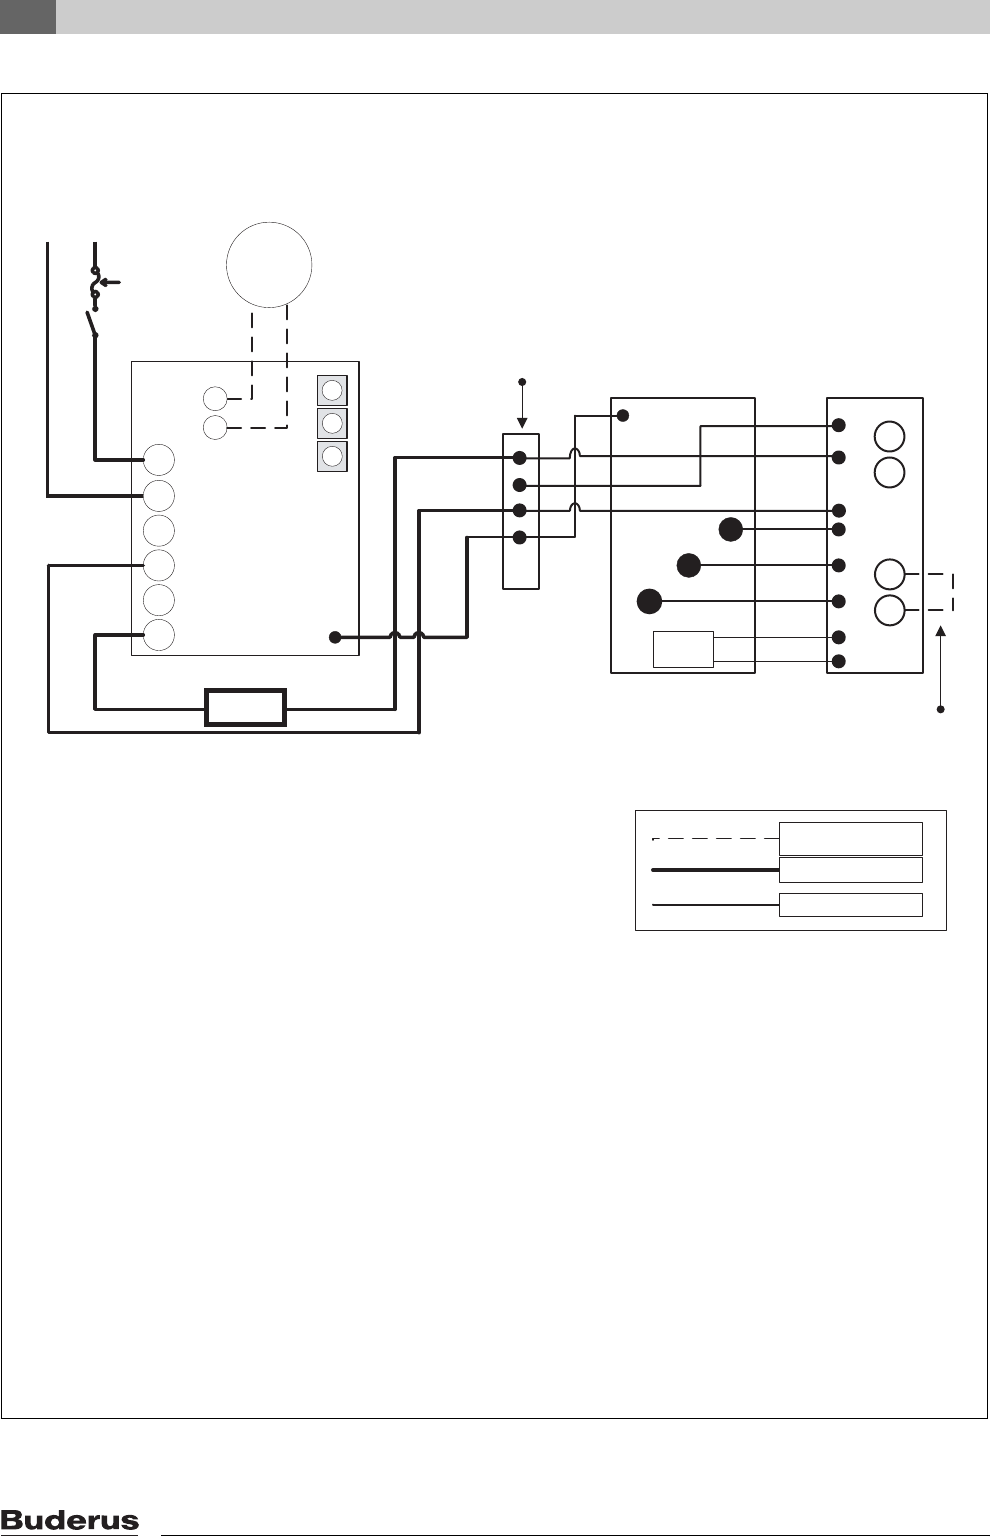 Fine Handleiding Buderus Logano G115 Ws Pagina 52 Van 60 English Wiring Cloud Brecesaoduqqnet